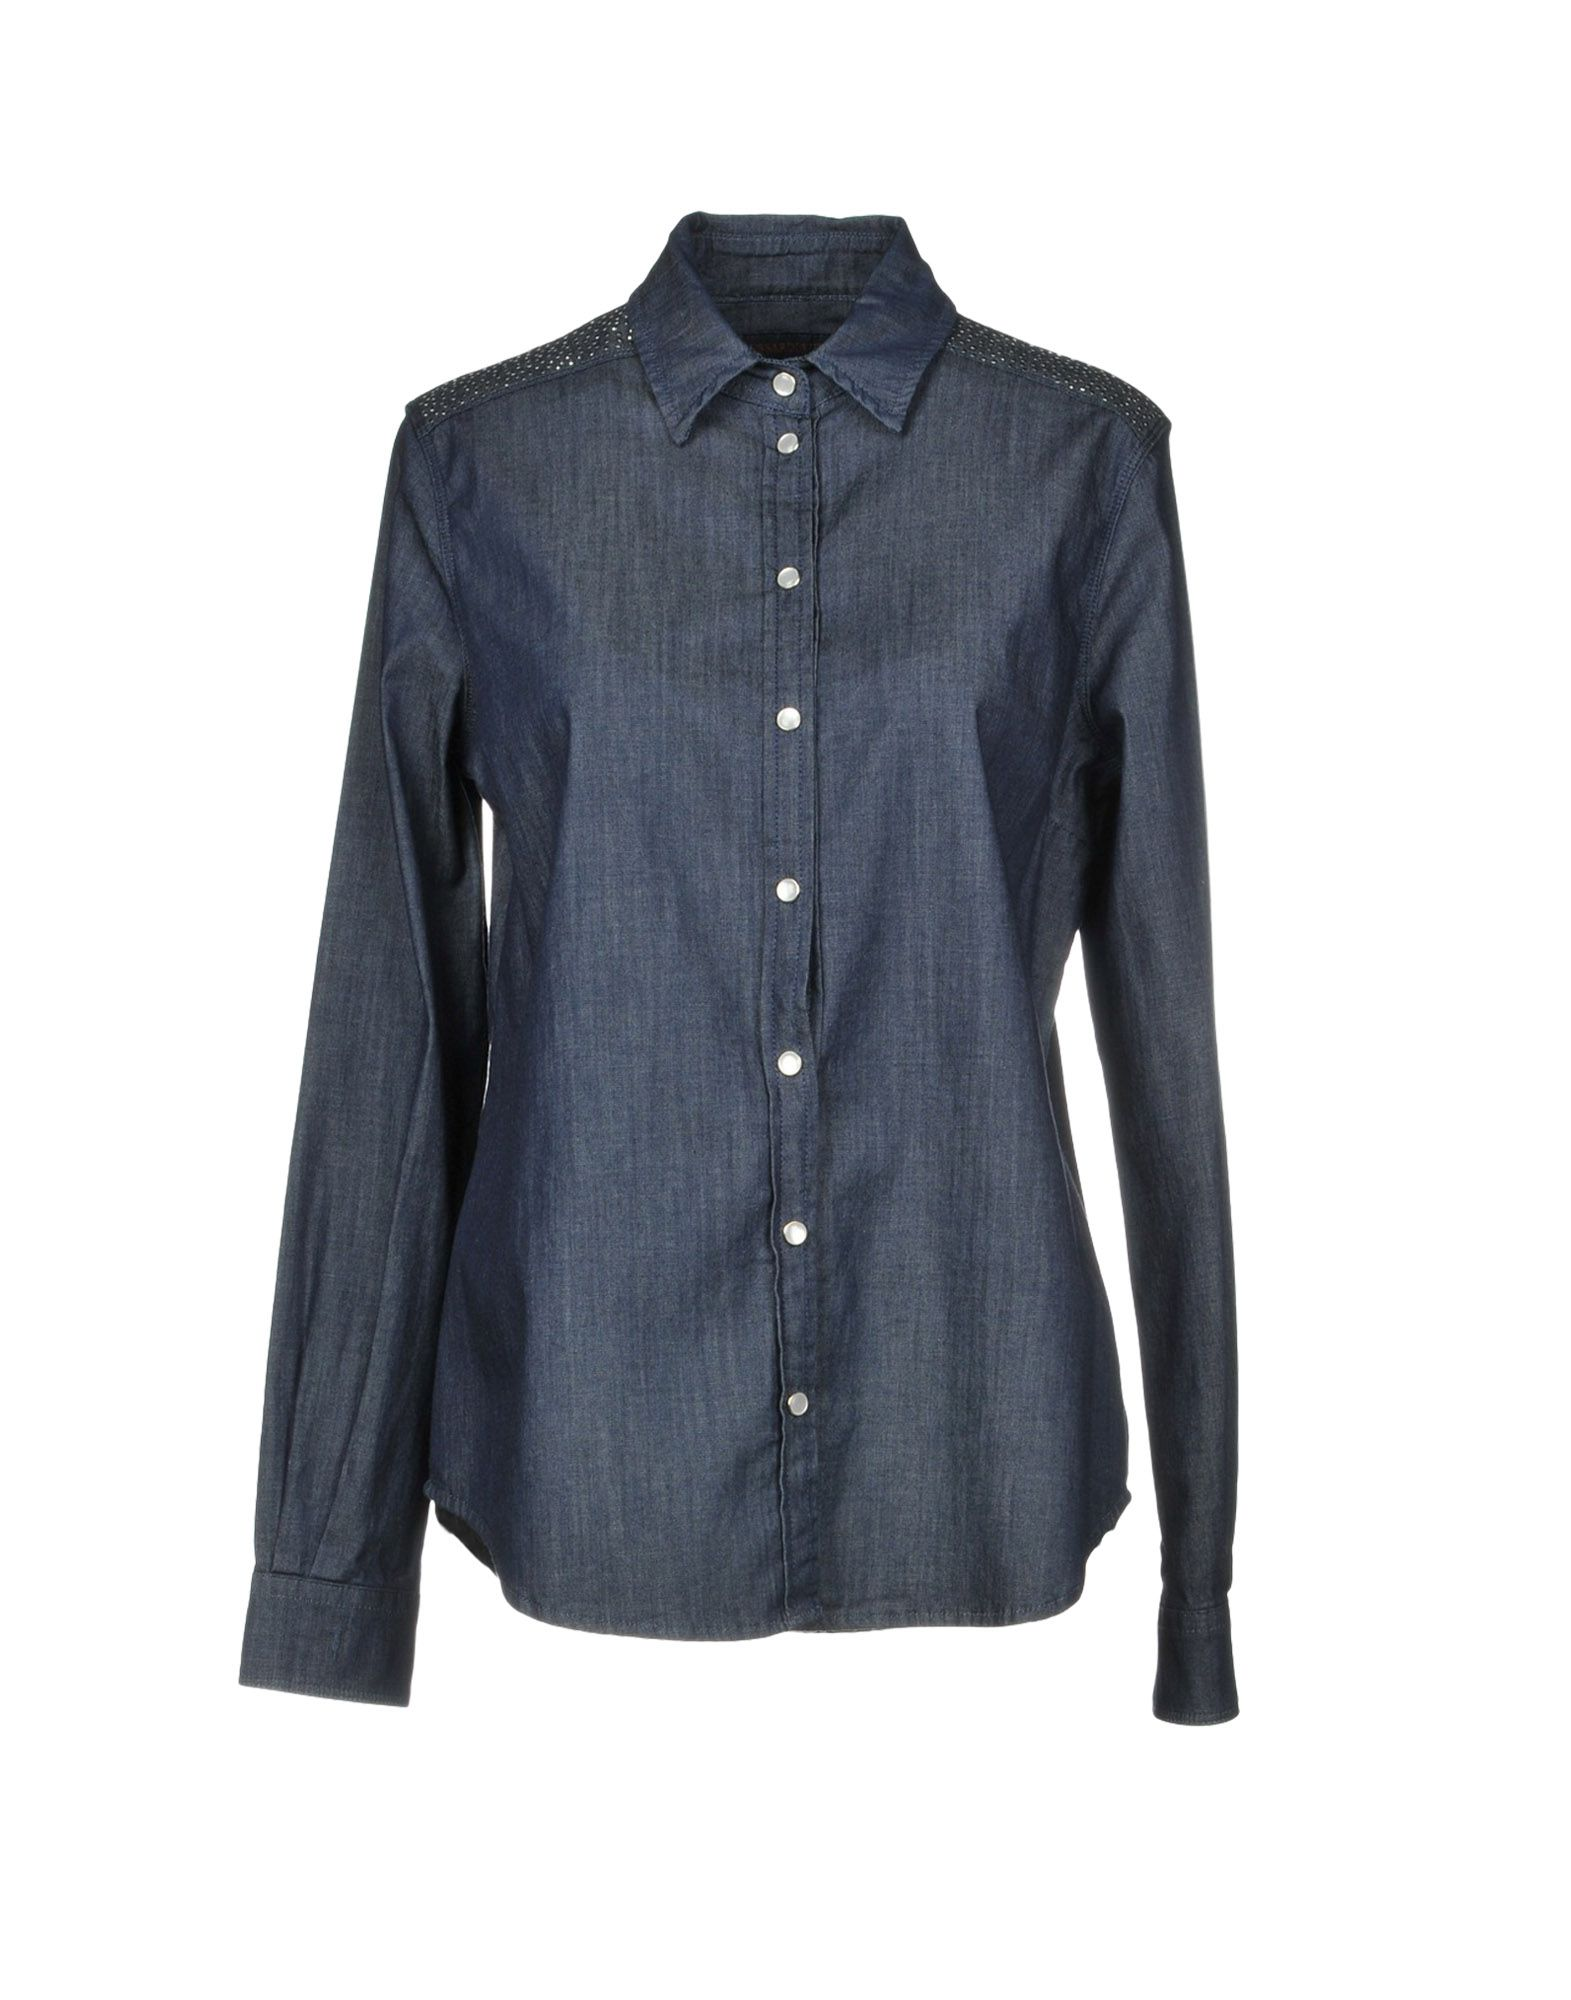 TRUSSARDI JEANS Джинсовая рубашка tru trussardi джинсовая рубашка